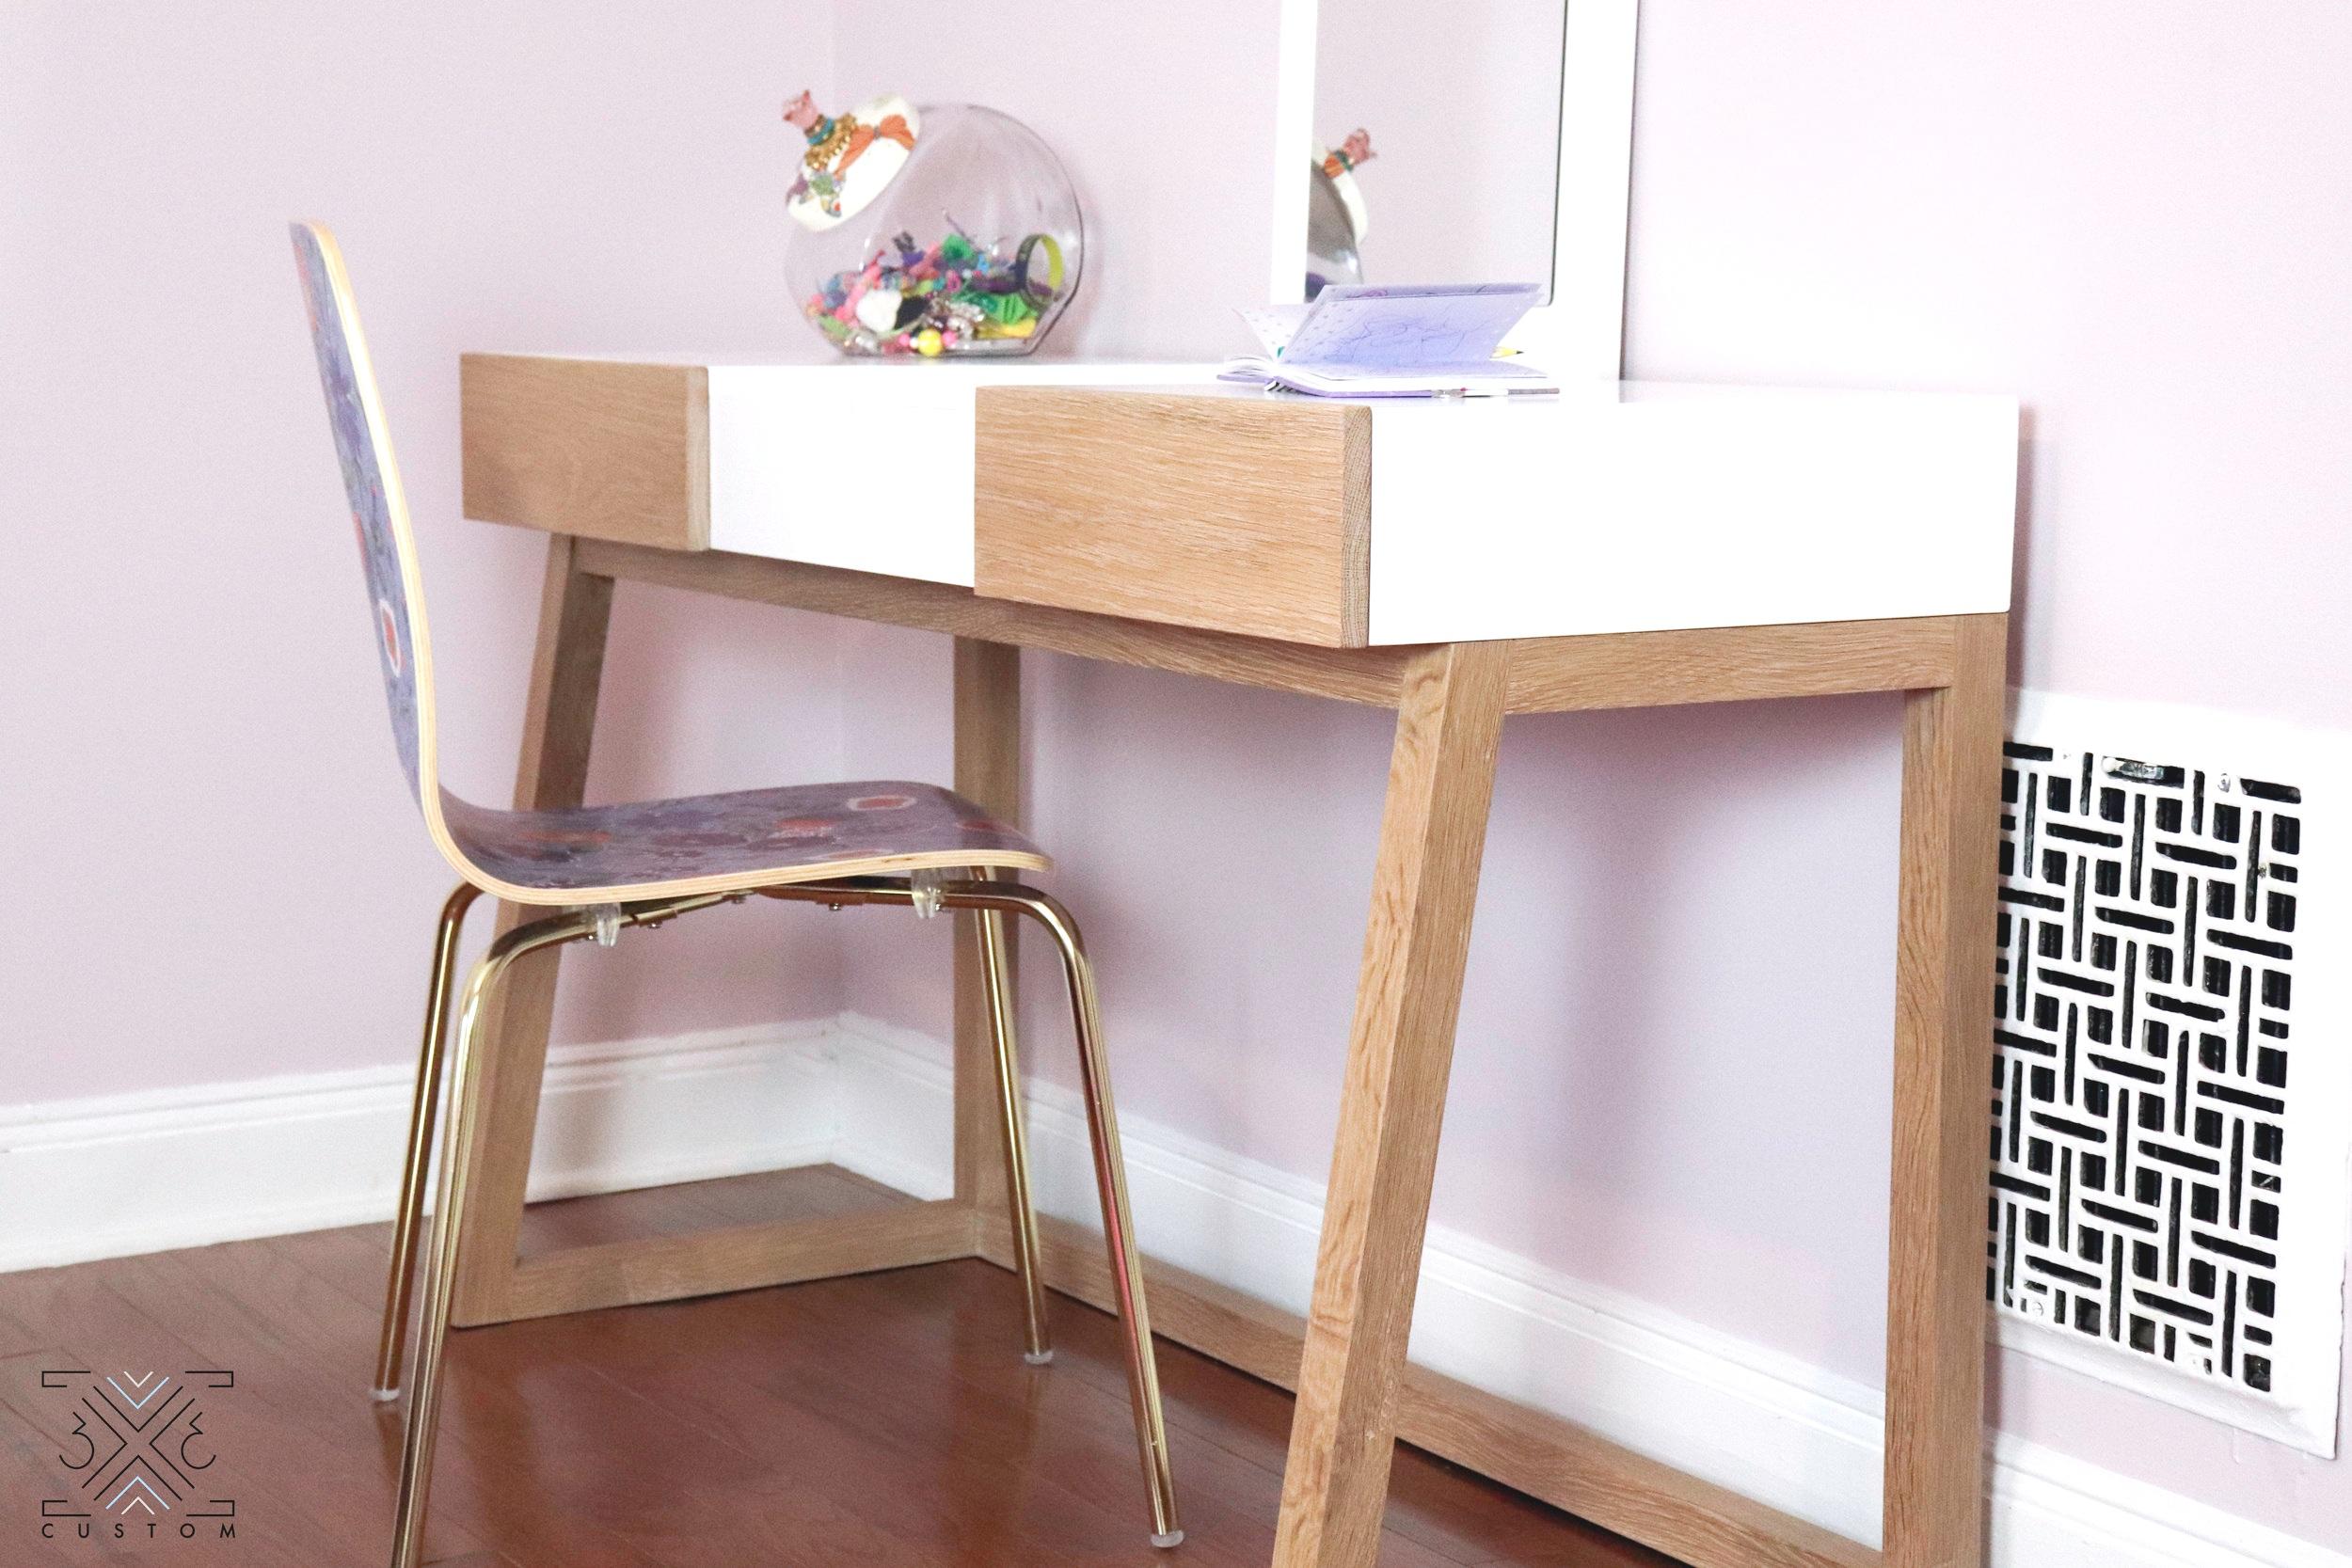 3x3+Custom+Modern+Vanity+Desk